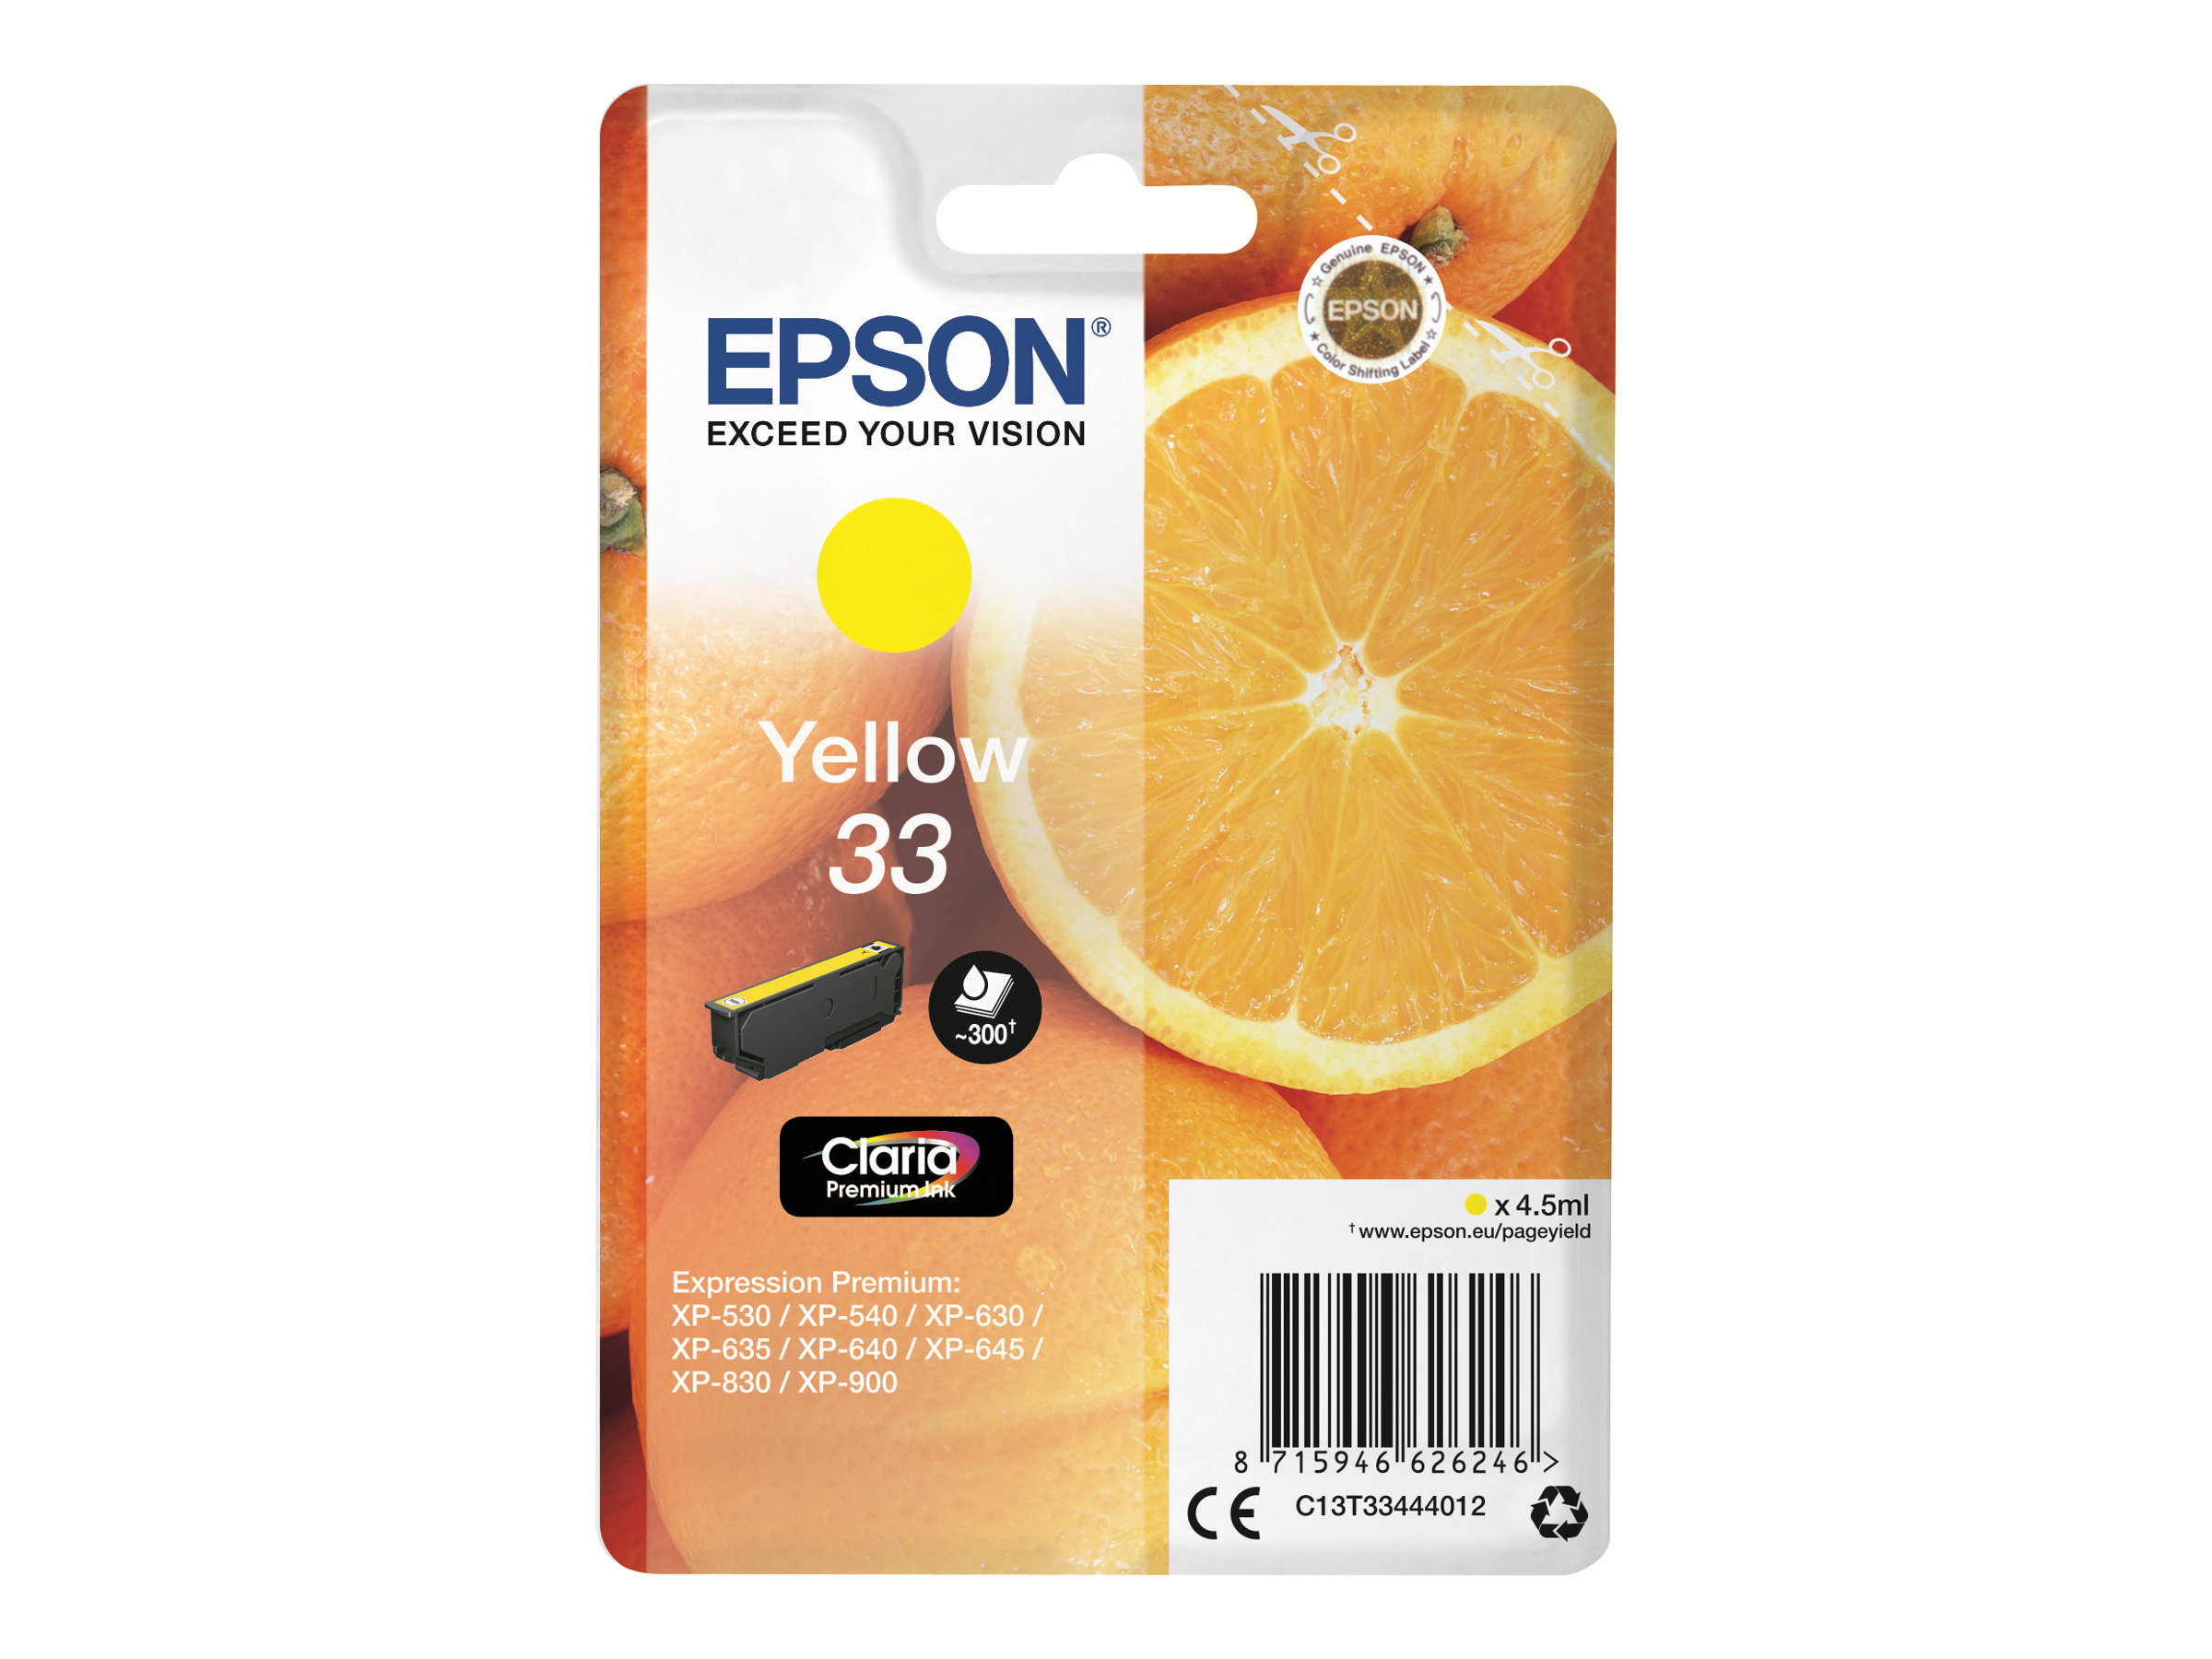 Epson 33 Oranges - jaune - cartouche d'encre originale